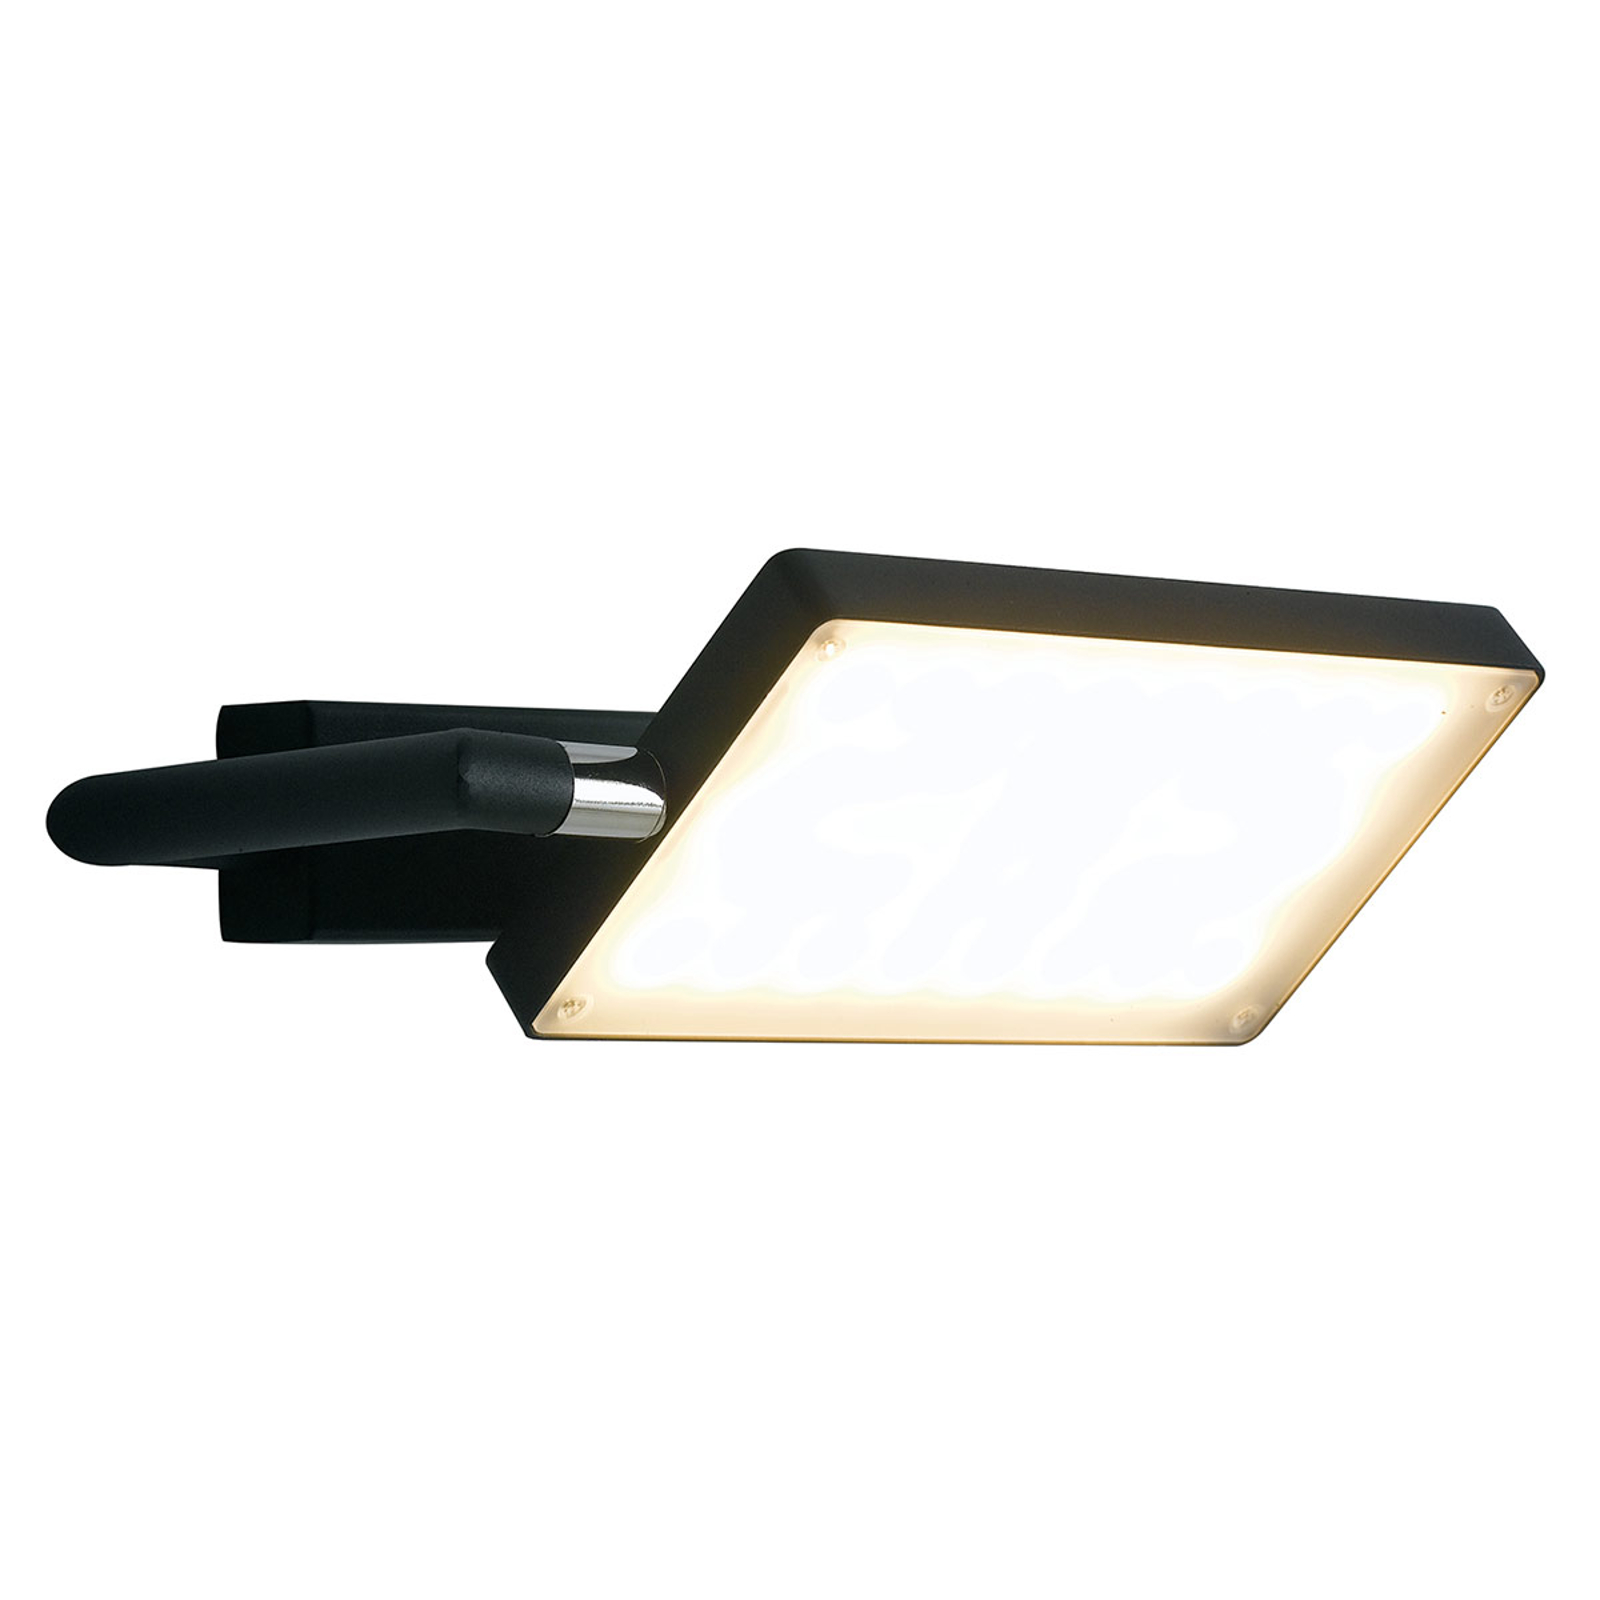 LED-Wandleuchte Book, schwarz